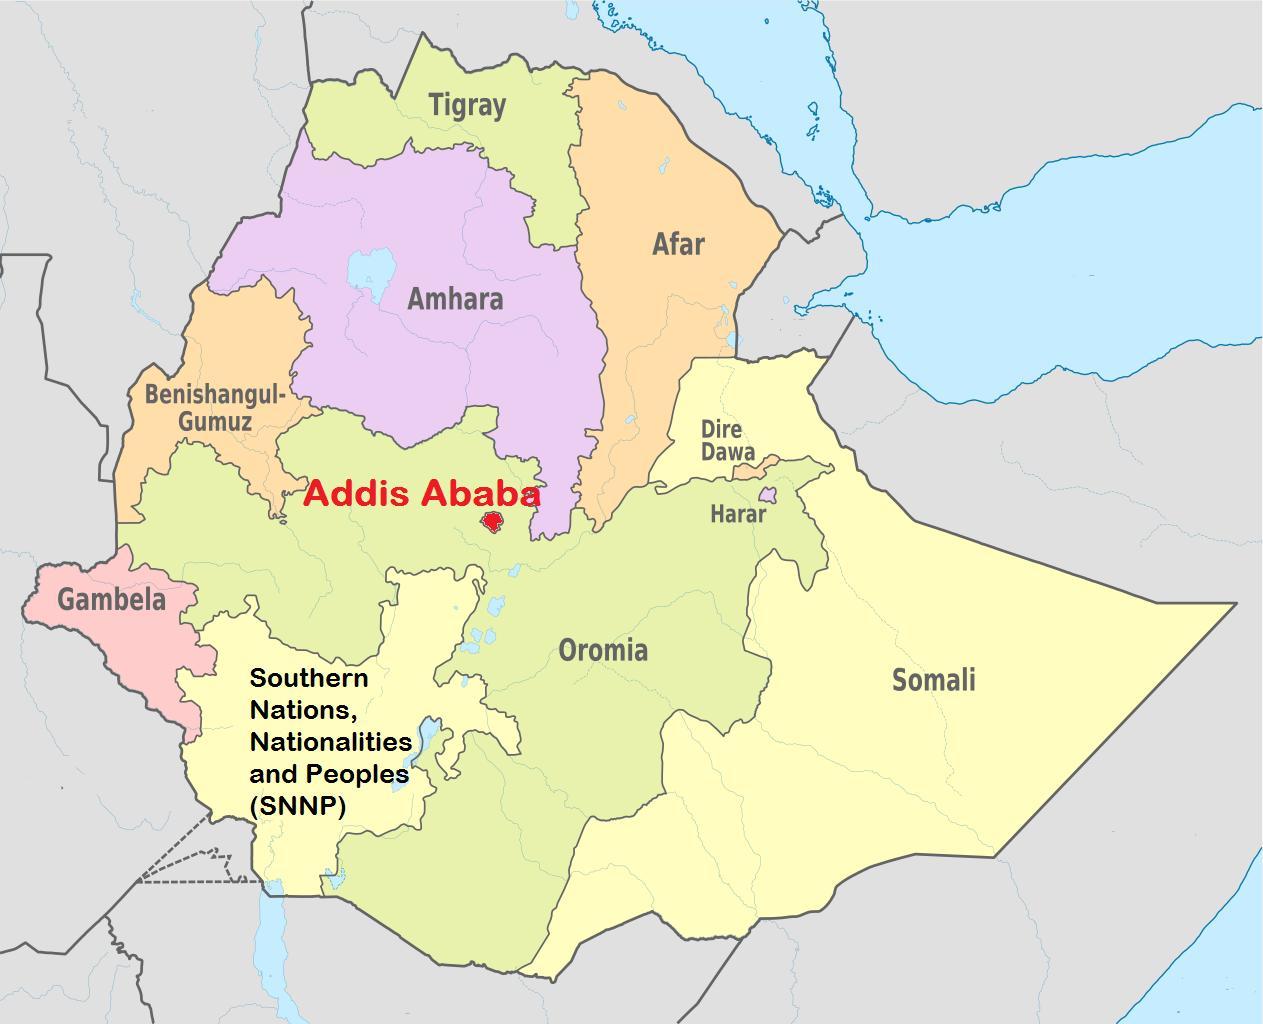 Addis ababa Ethiopia map - Addis ababa Ethiopia map world (Eastern ...